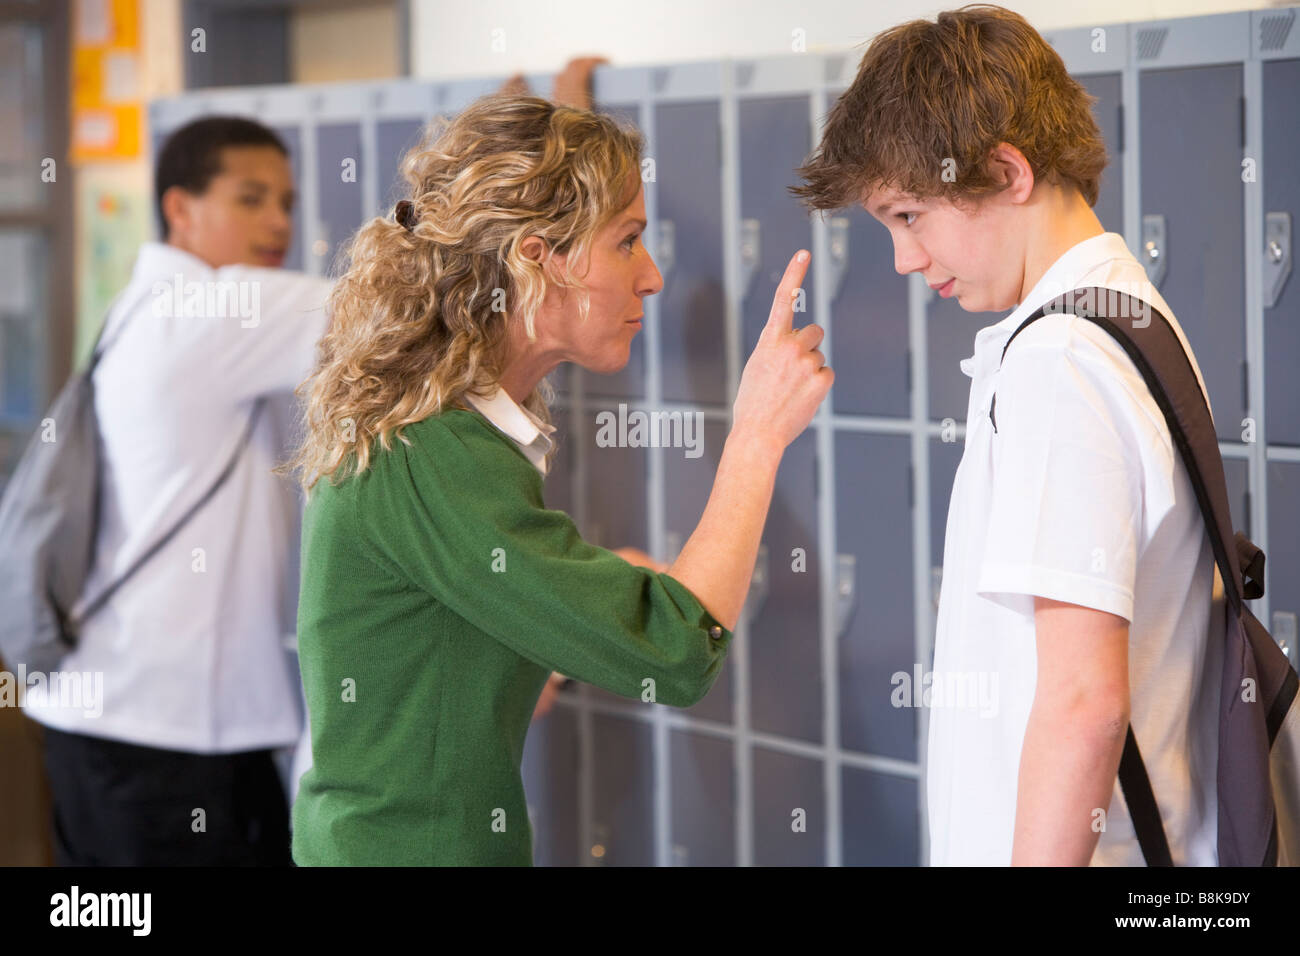 NOLA: Female teacher and male students